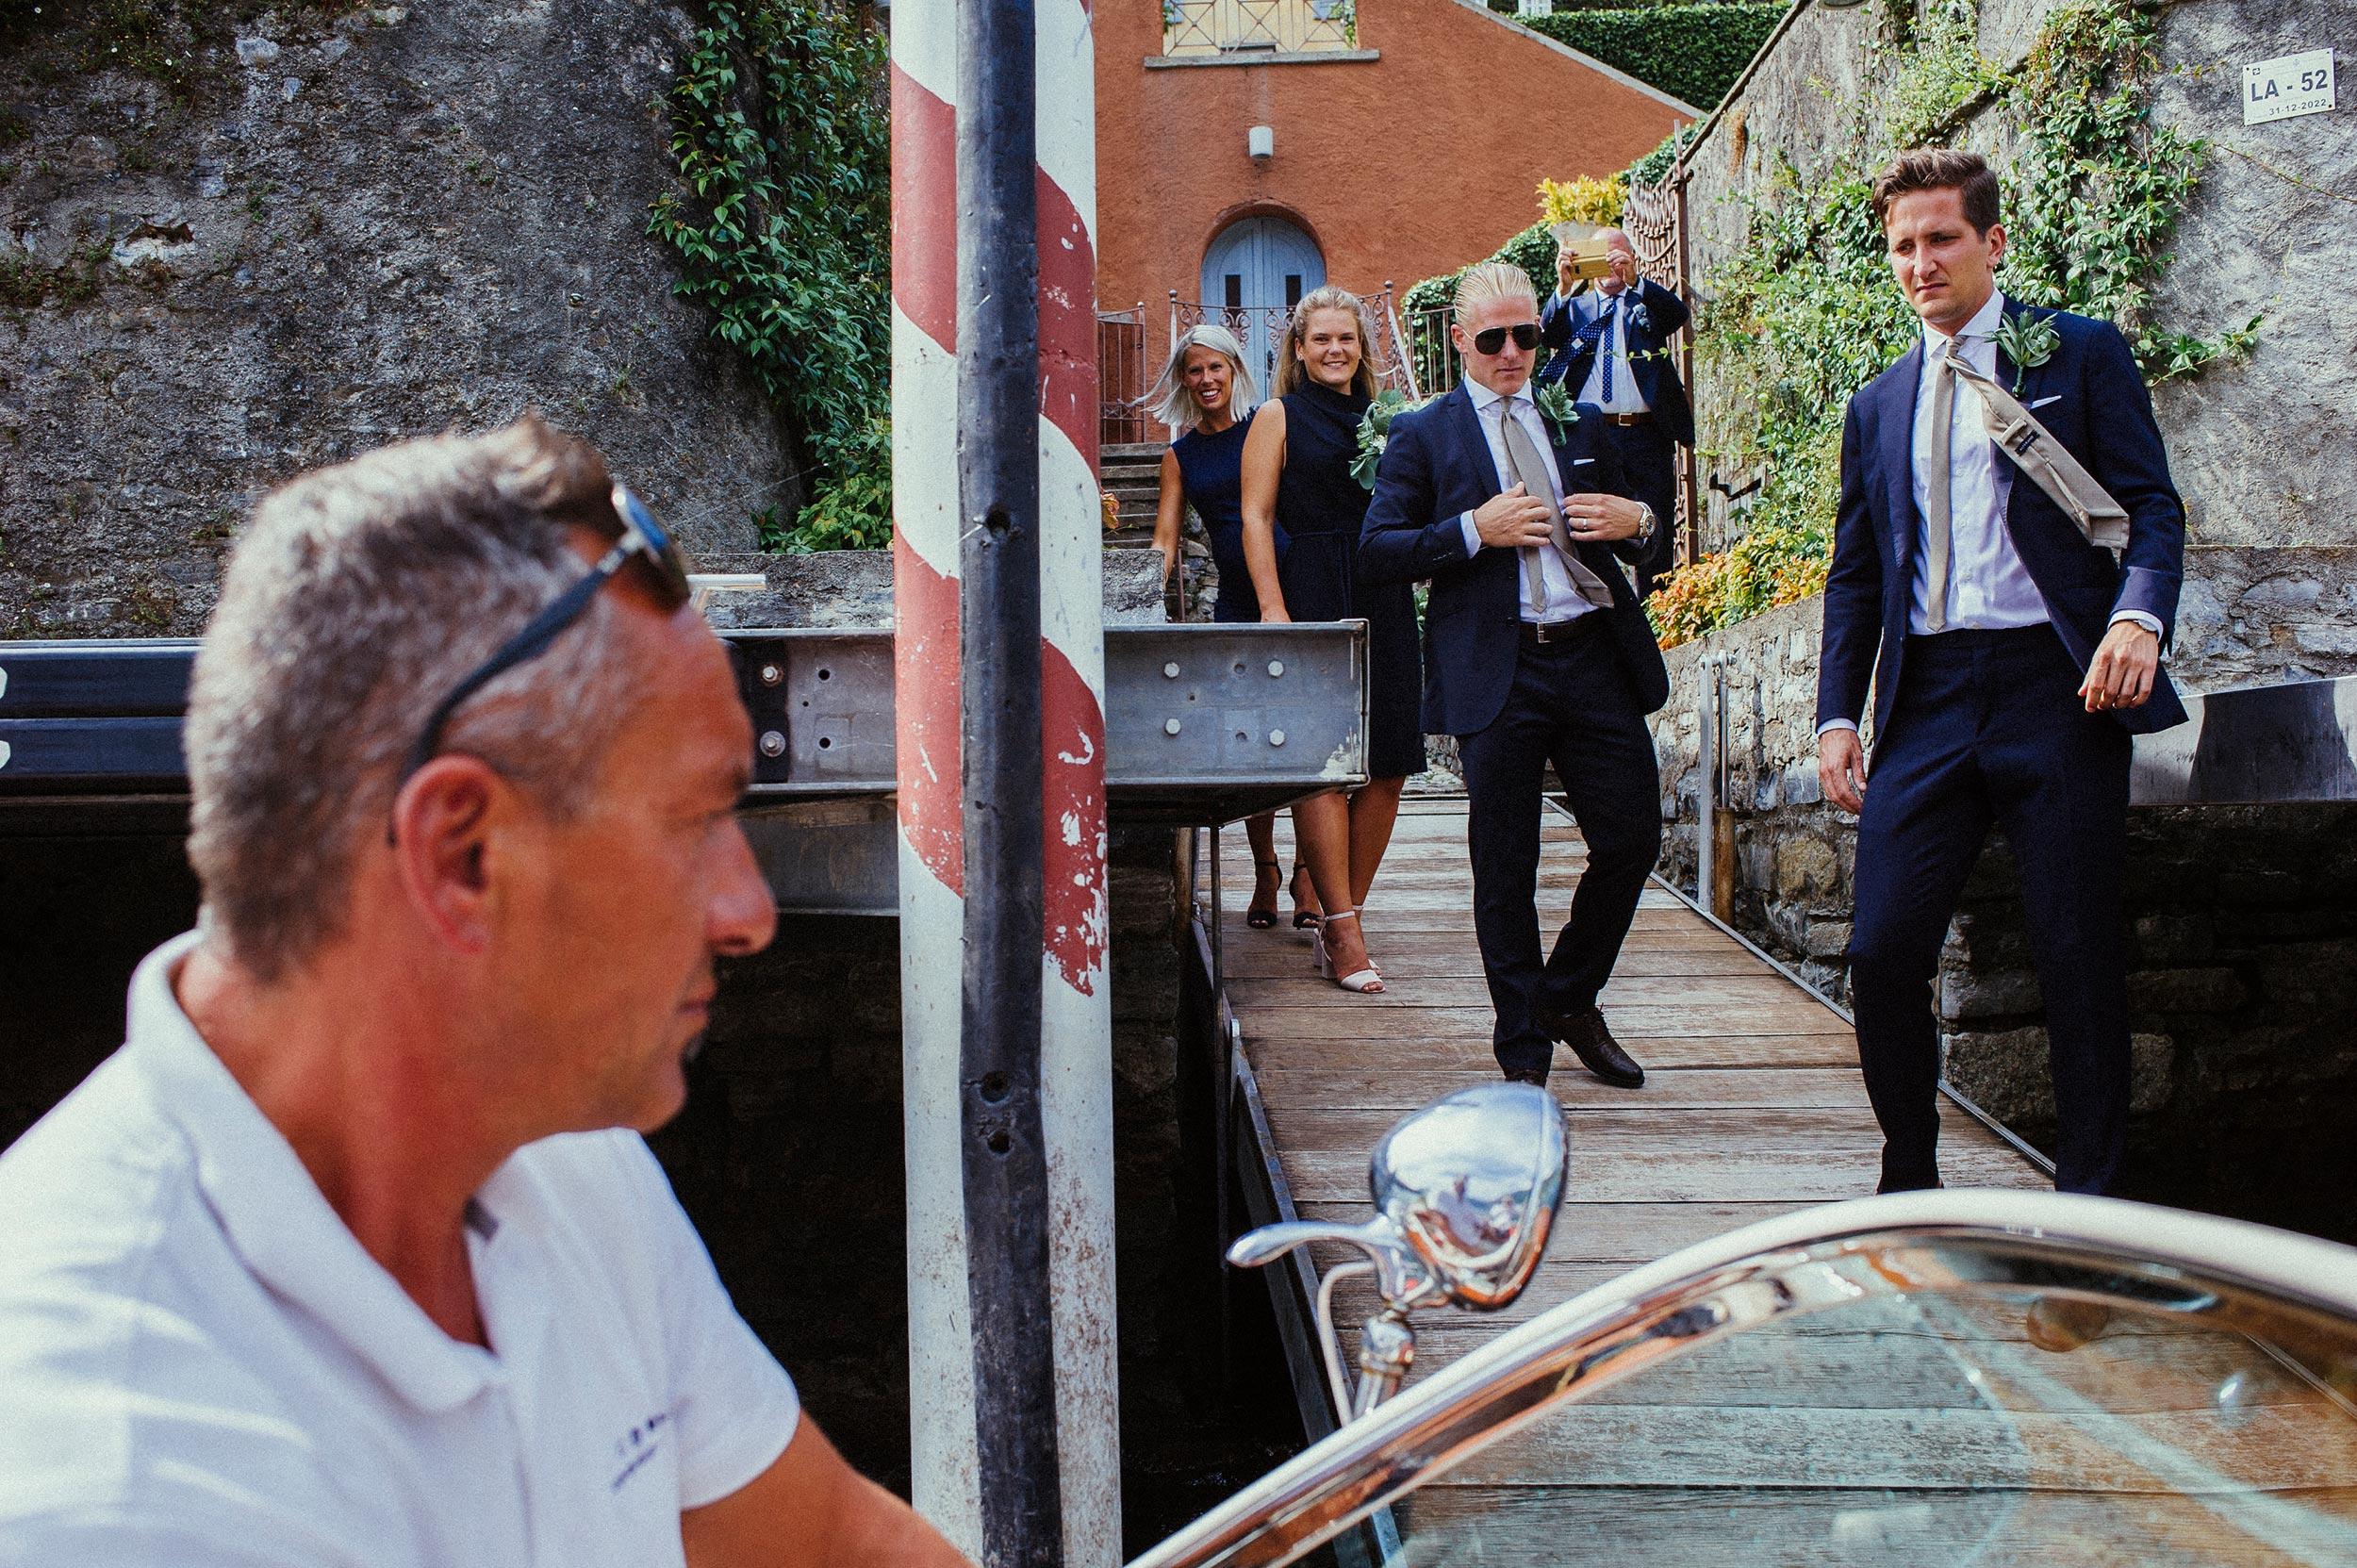 2018-Villa-Regina-Teodolinda-Lake-Como-Wedding-Photographer-Italy-Alessandro-Avenali-162.jpg